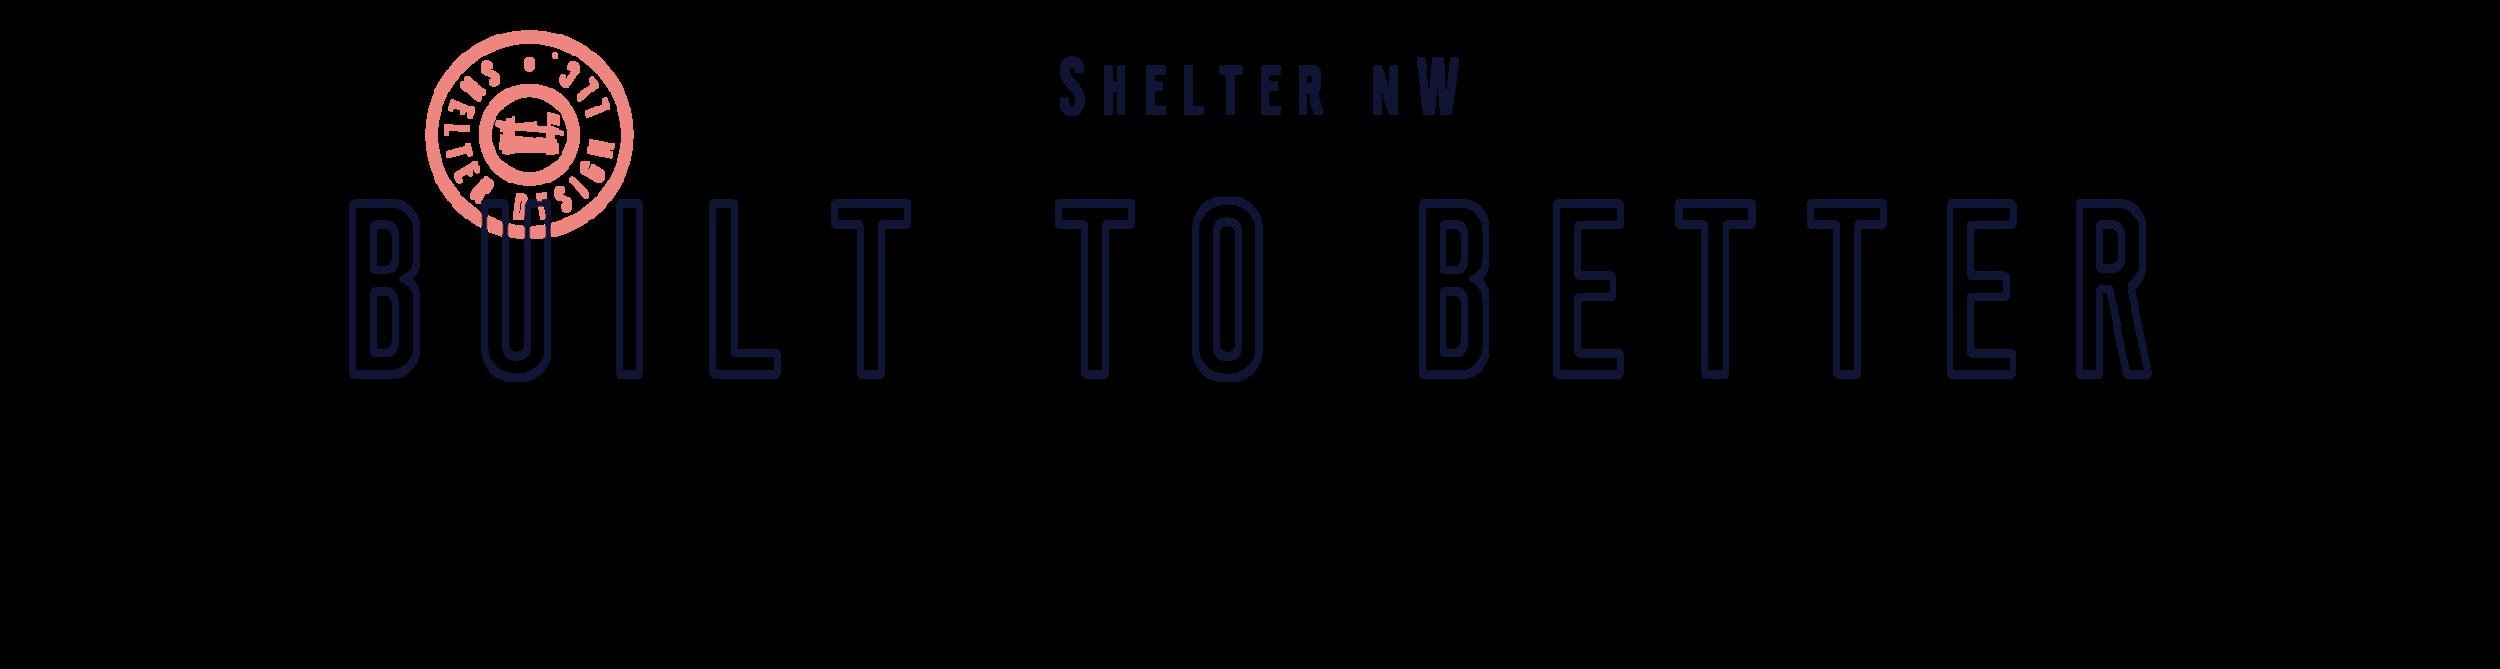 Shelter_Website_motto-01-01.jpg